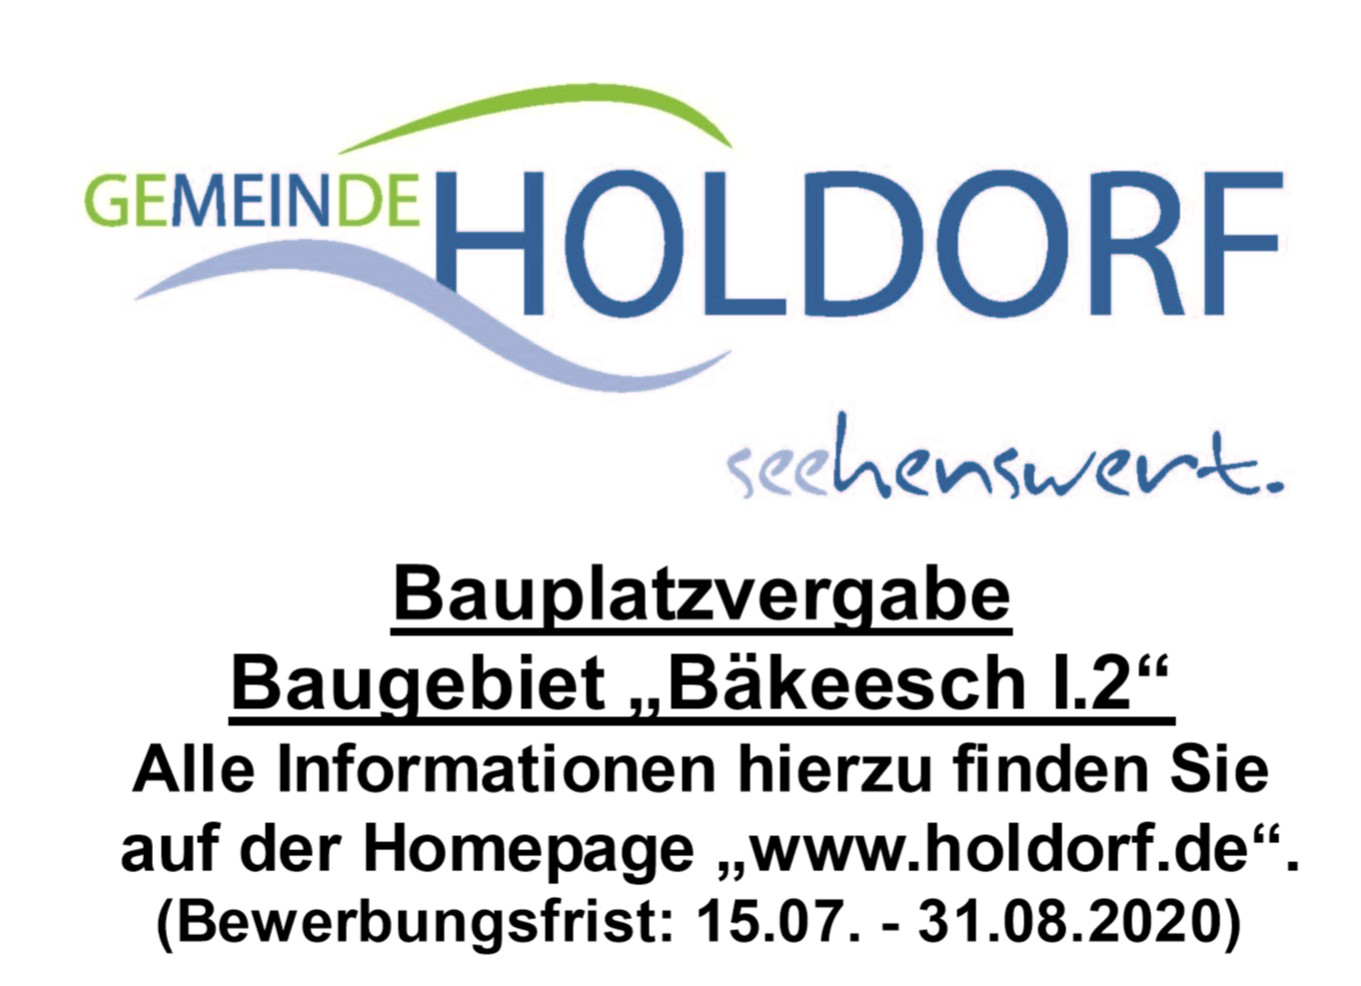 Bauplatzvergabe-Baekeesch_I.2